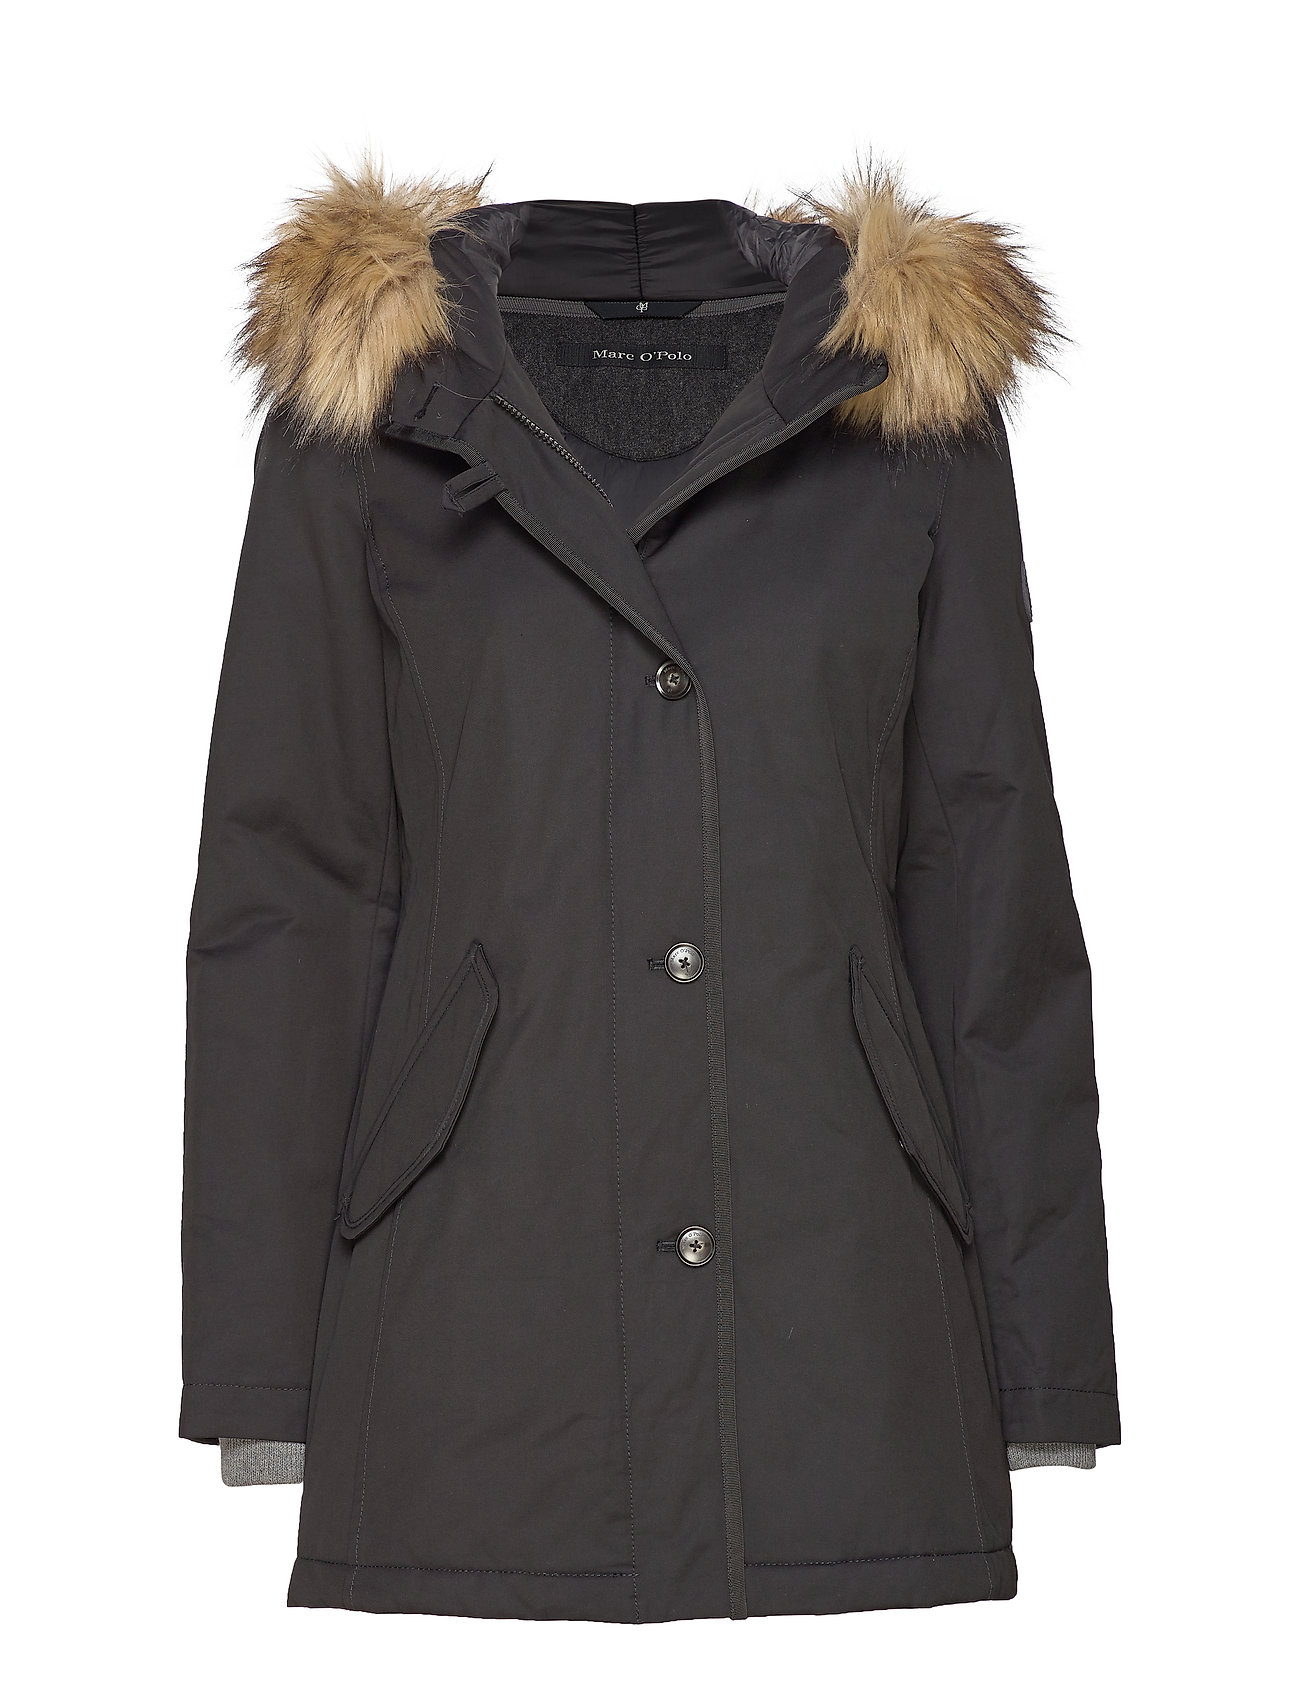 Marc O'Polo Coat, short parka, thermore, shaped - BLACK